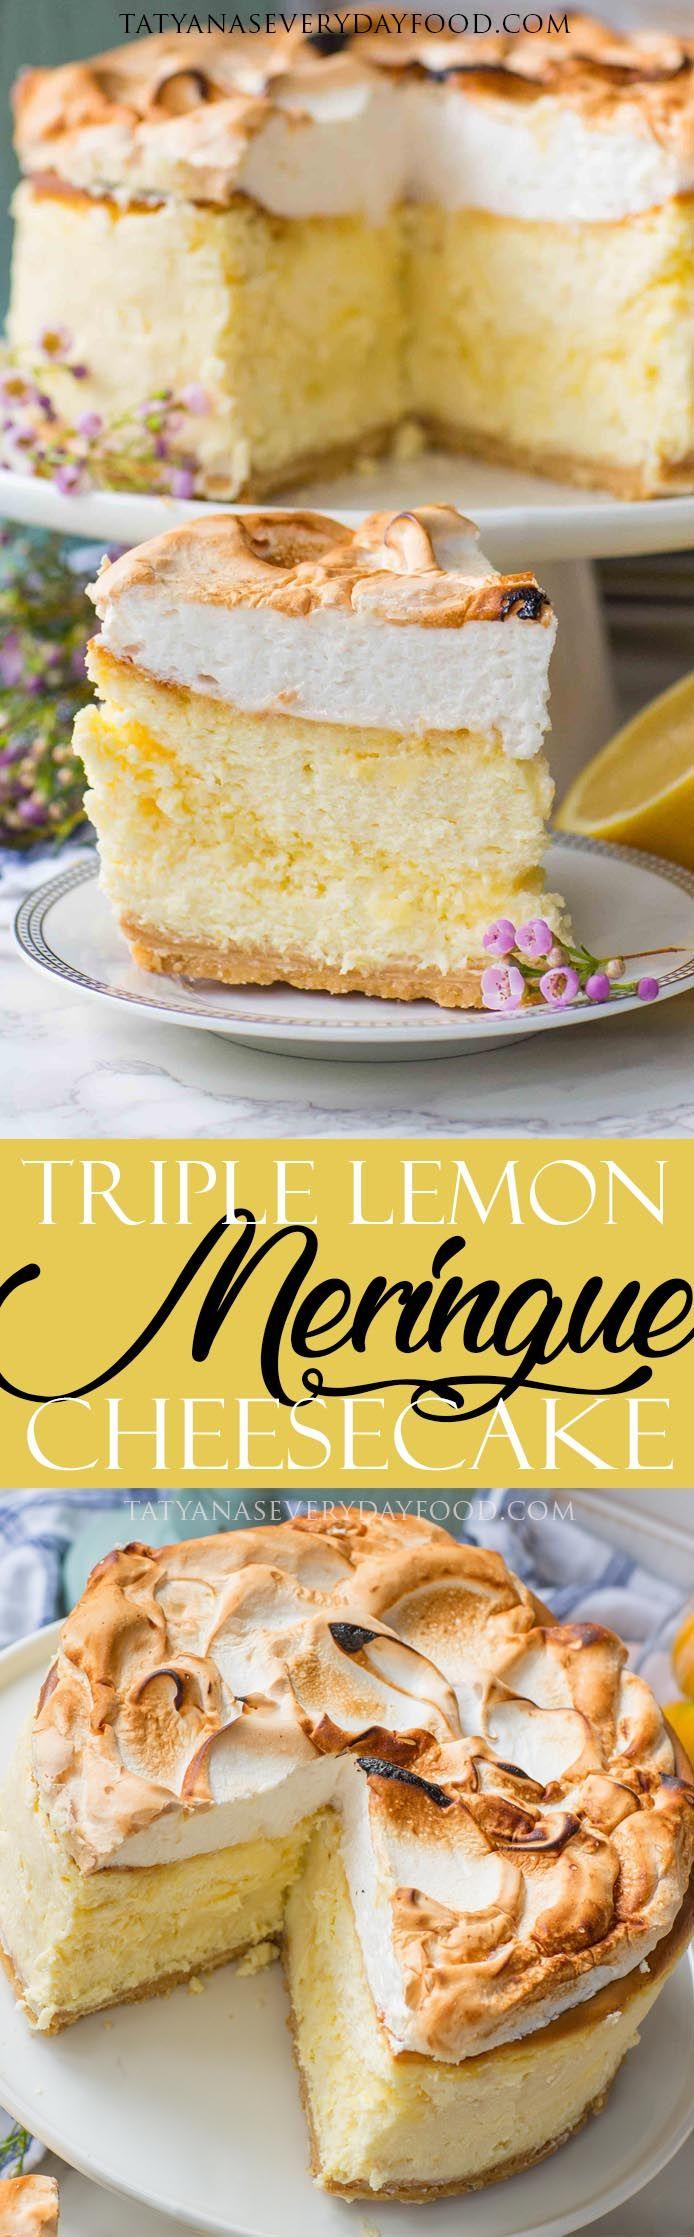 Triple Lemon Meringue Cheesecake (video) #lemonmeringuecheesecake